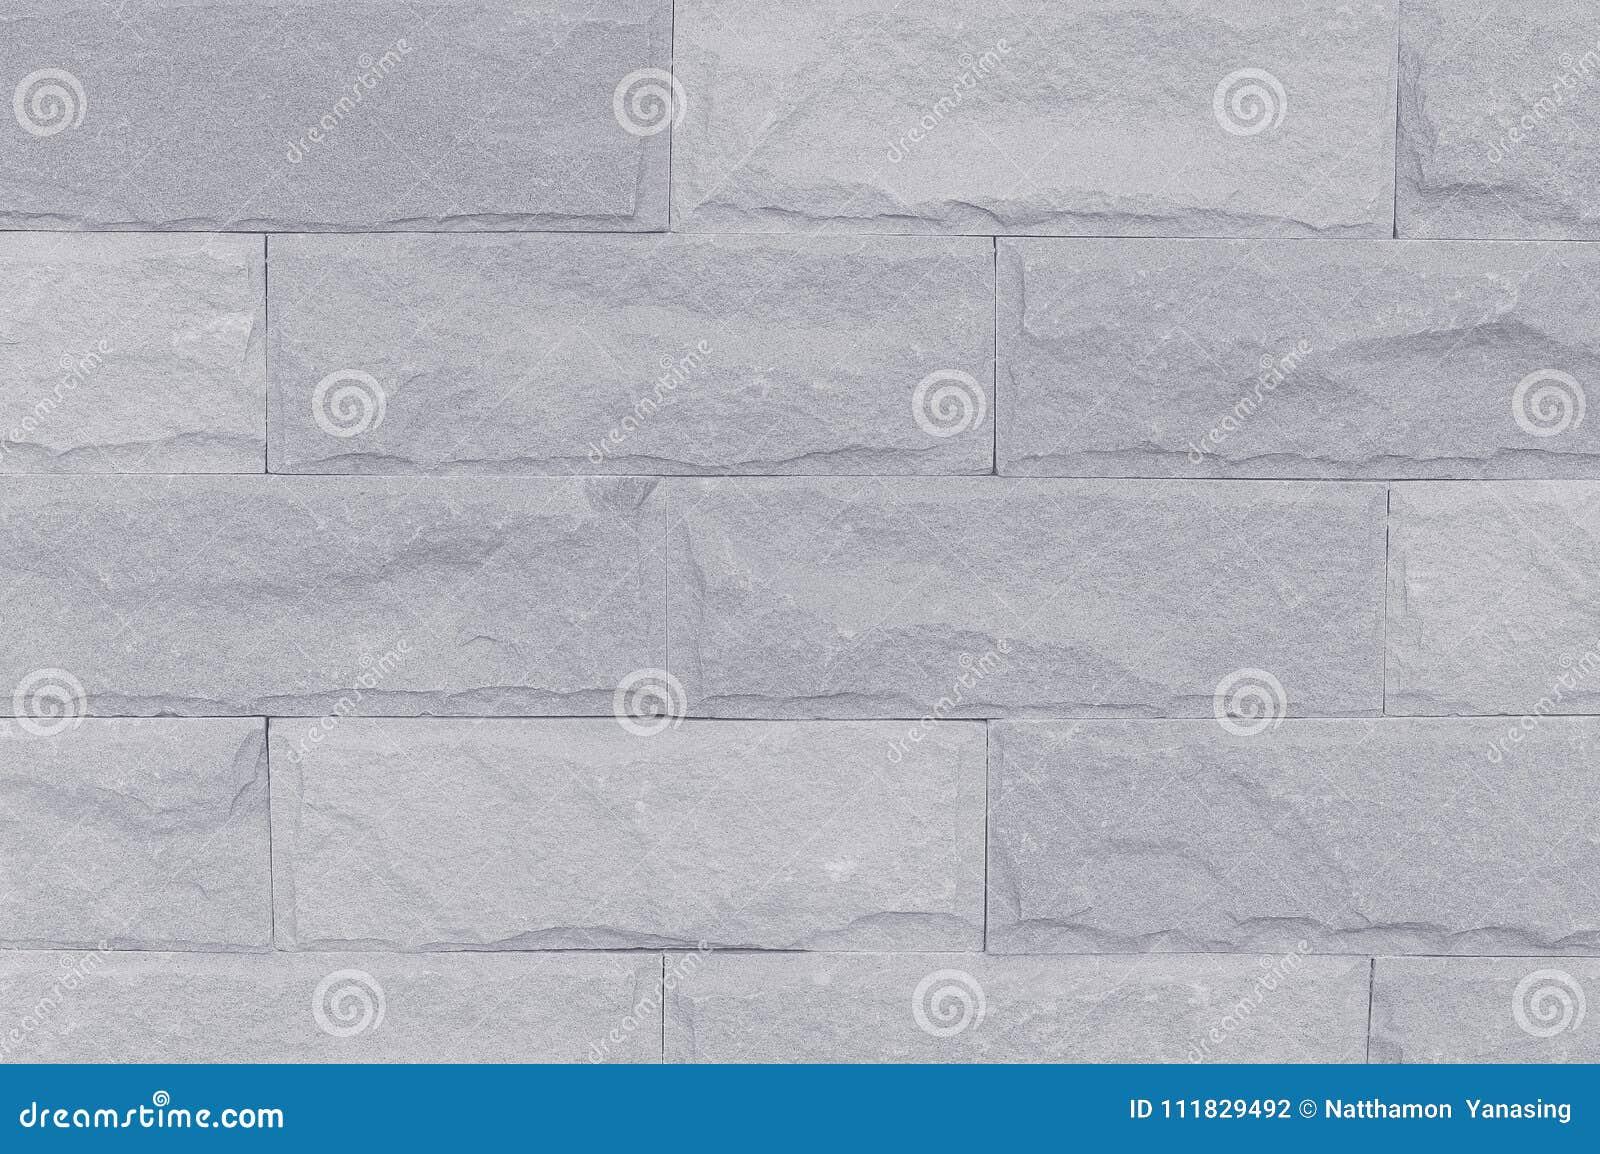 Luxury Brick Wall Design Patterns